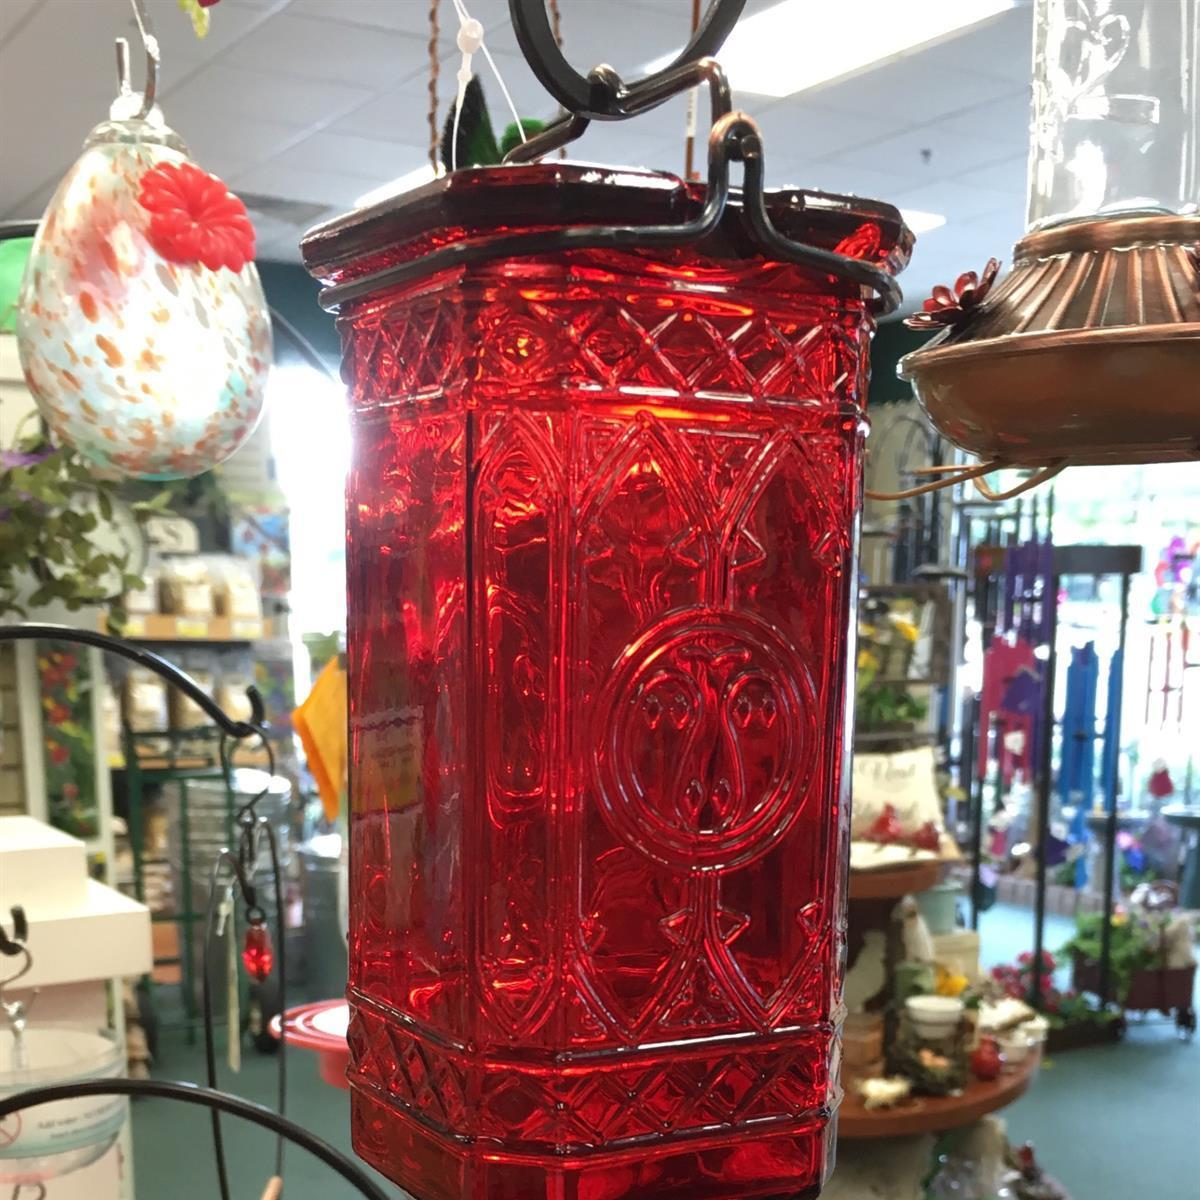 Hummingbird, hummingbirds, feeder, nectar, antique bottle, red glass, hummingbird feeder